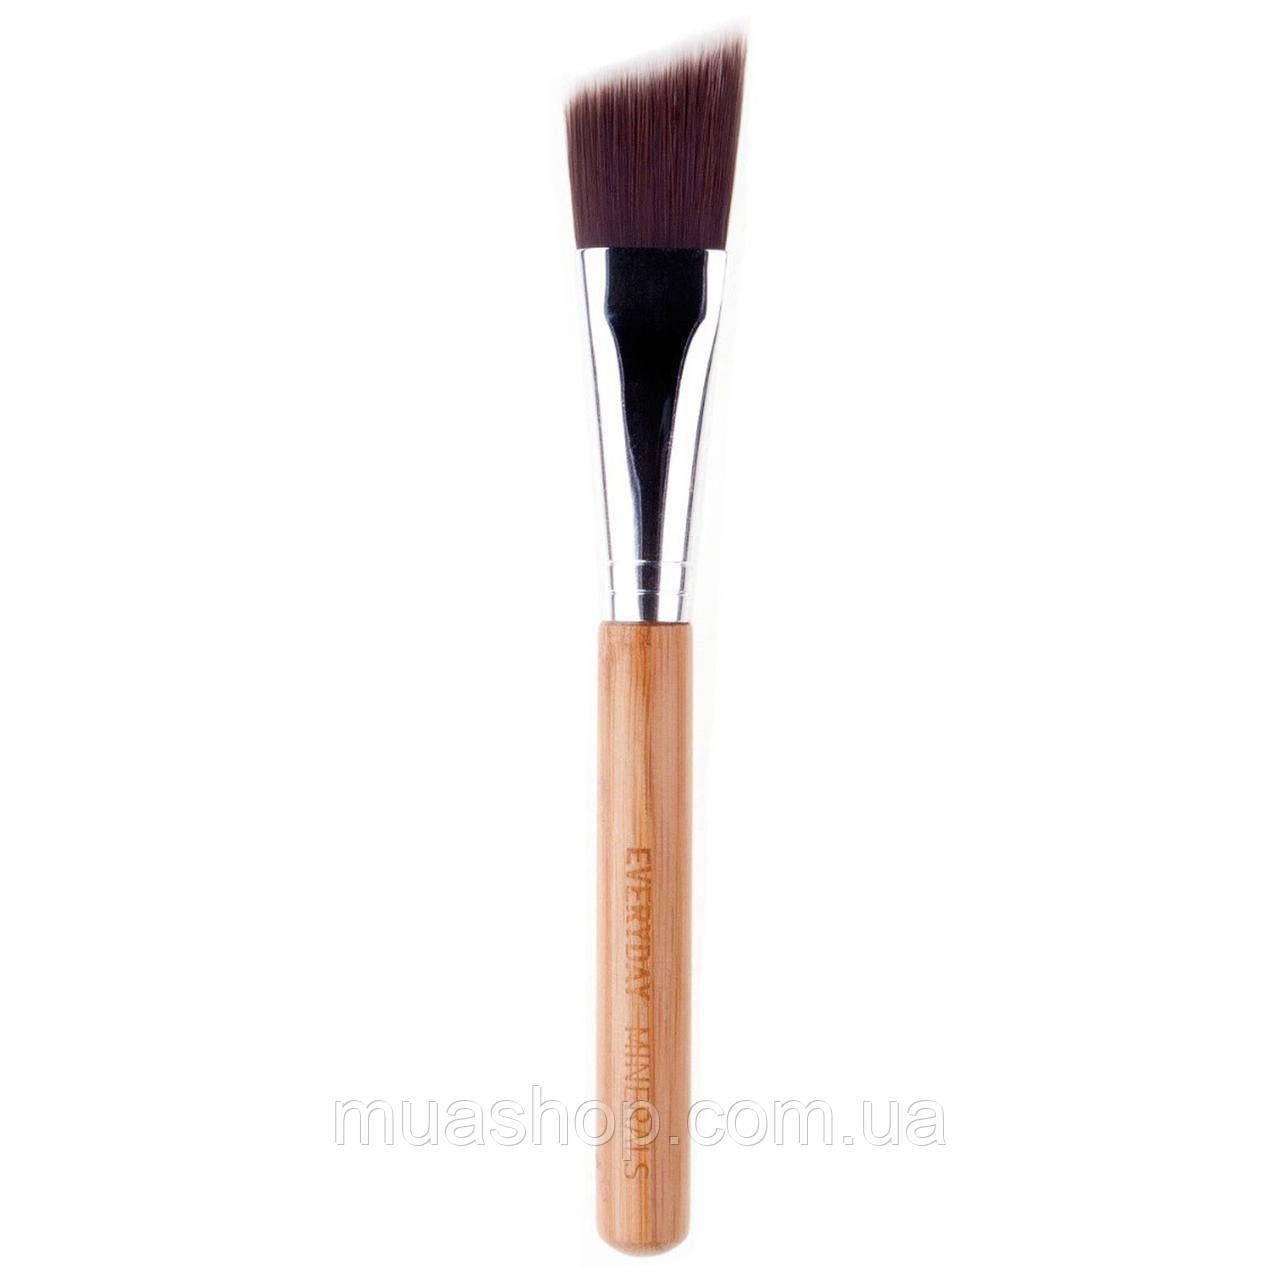 Угловая кисть для контуринга EVERYDAY MINERALS Angled Face Brush